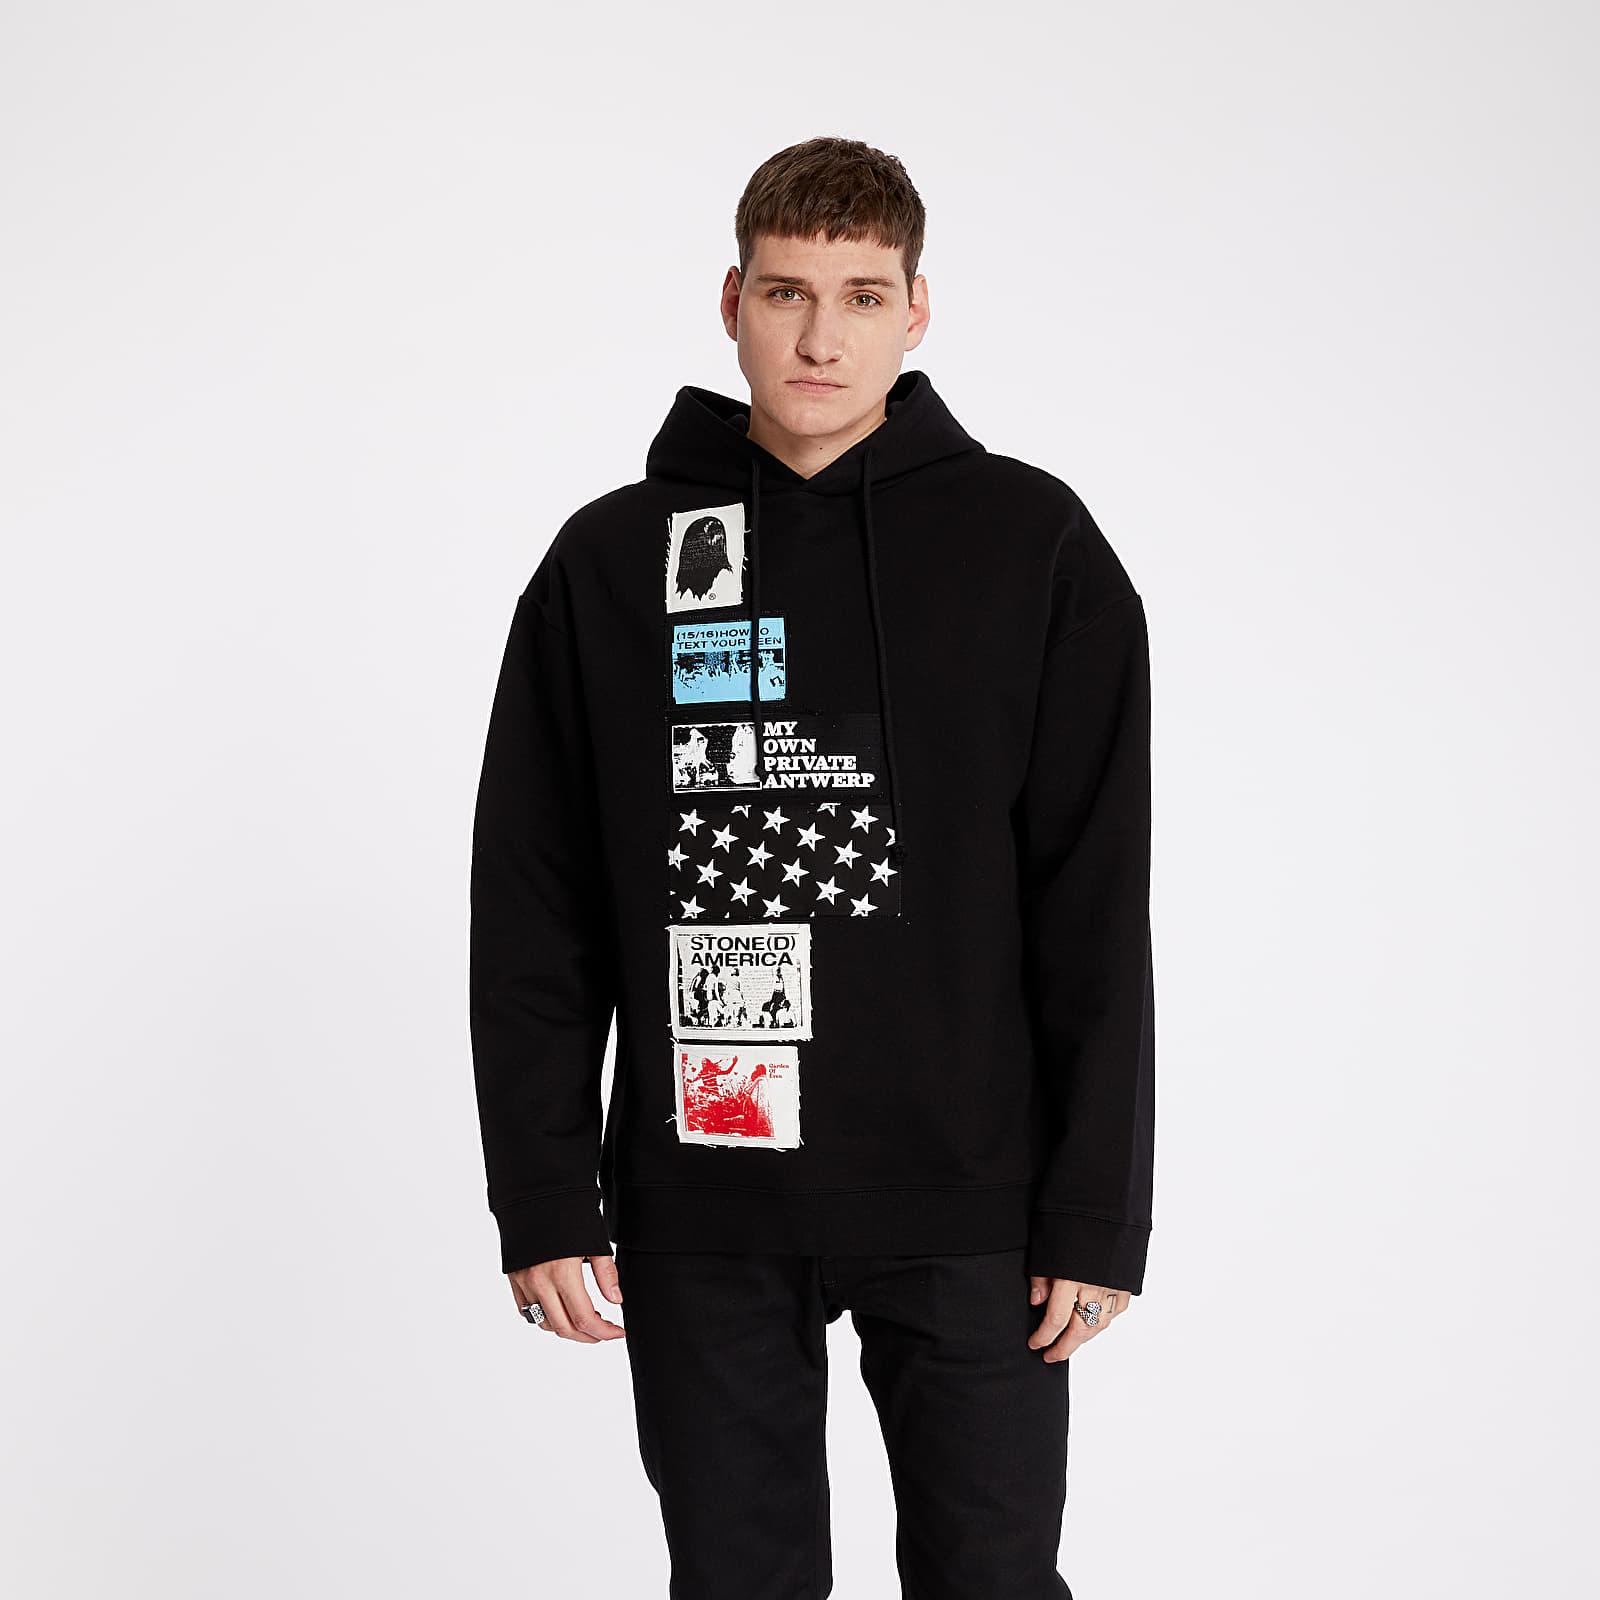 Sweatshirts RAF SIMONS Hoodie Black